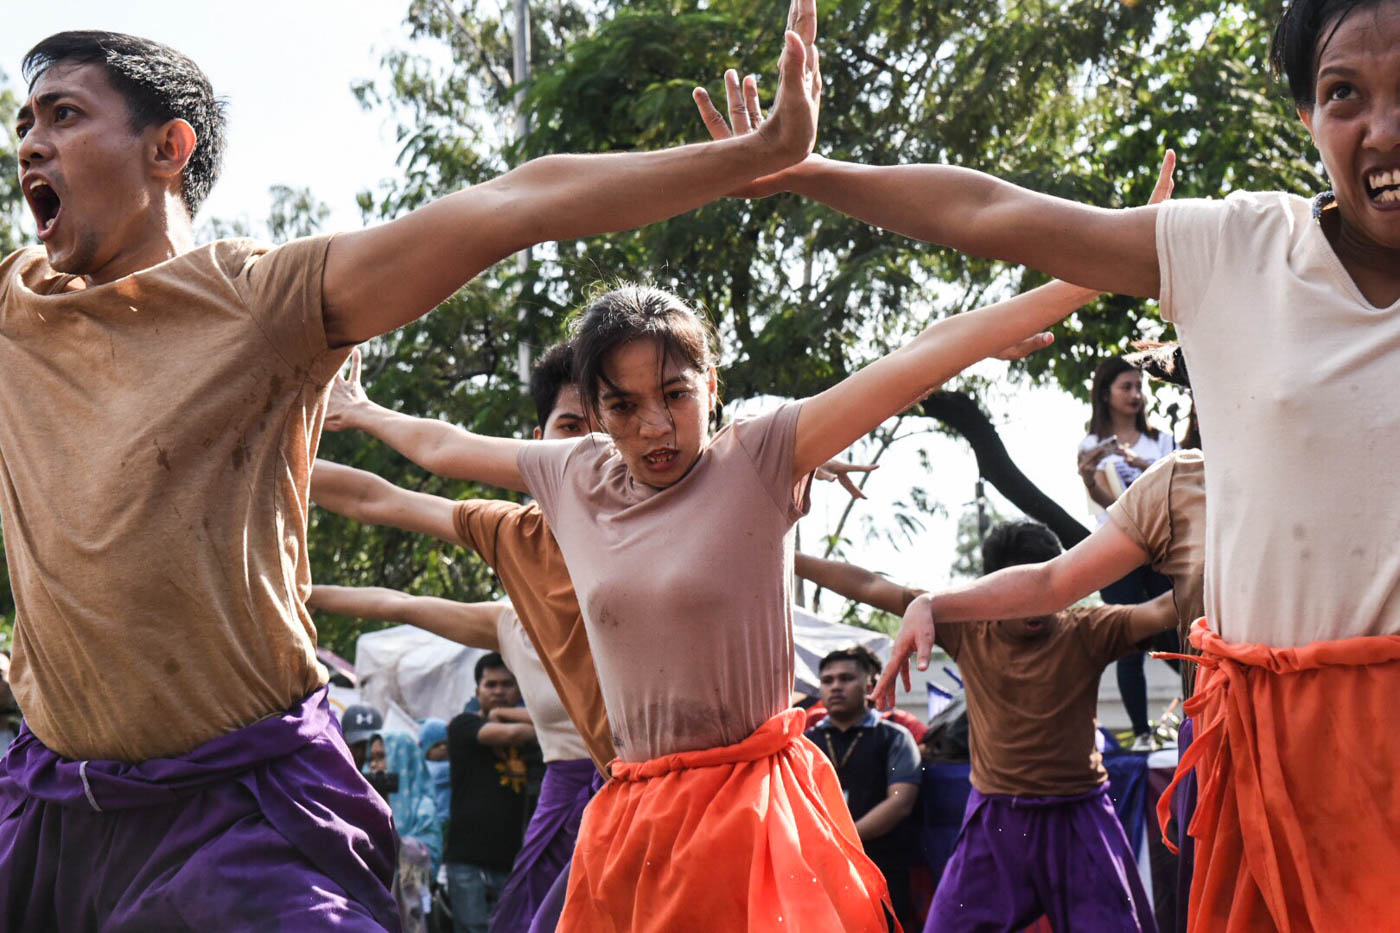 Artists perform at Liwasang Bonifacio in Manila to commemorate International Women's Day. Photo by Alecs Ongcal/Rappler